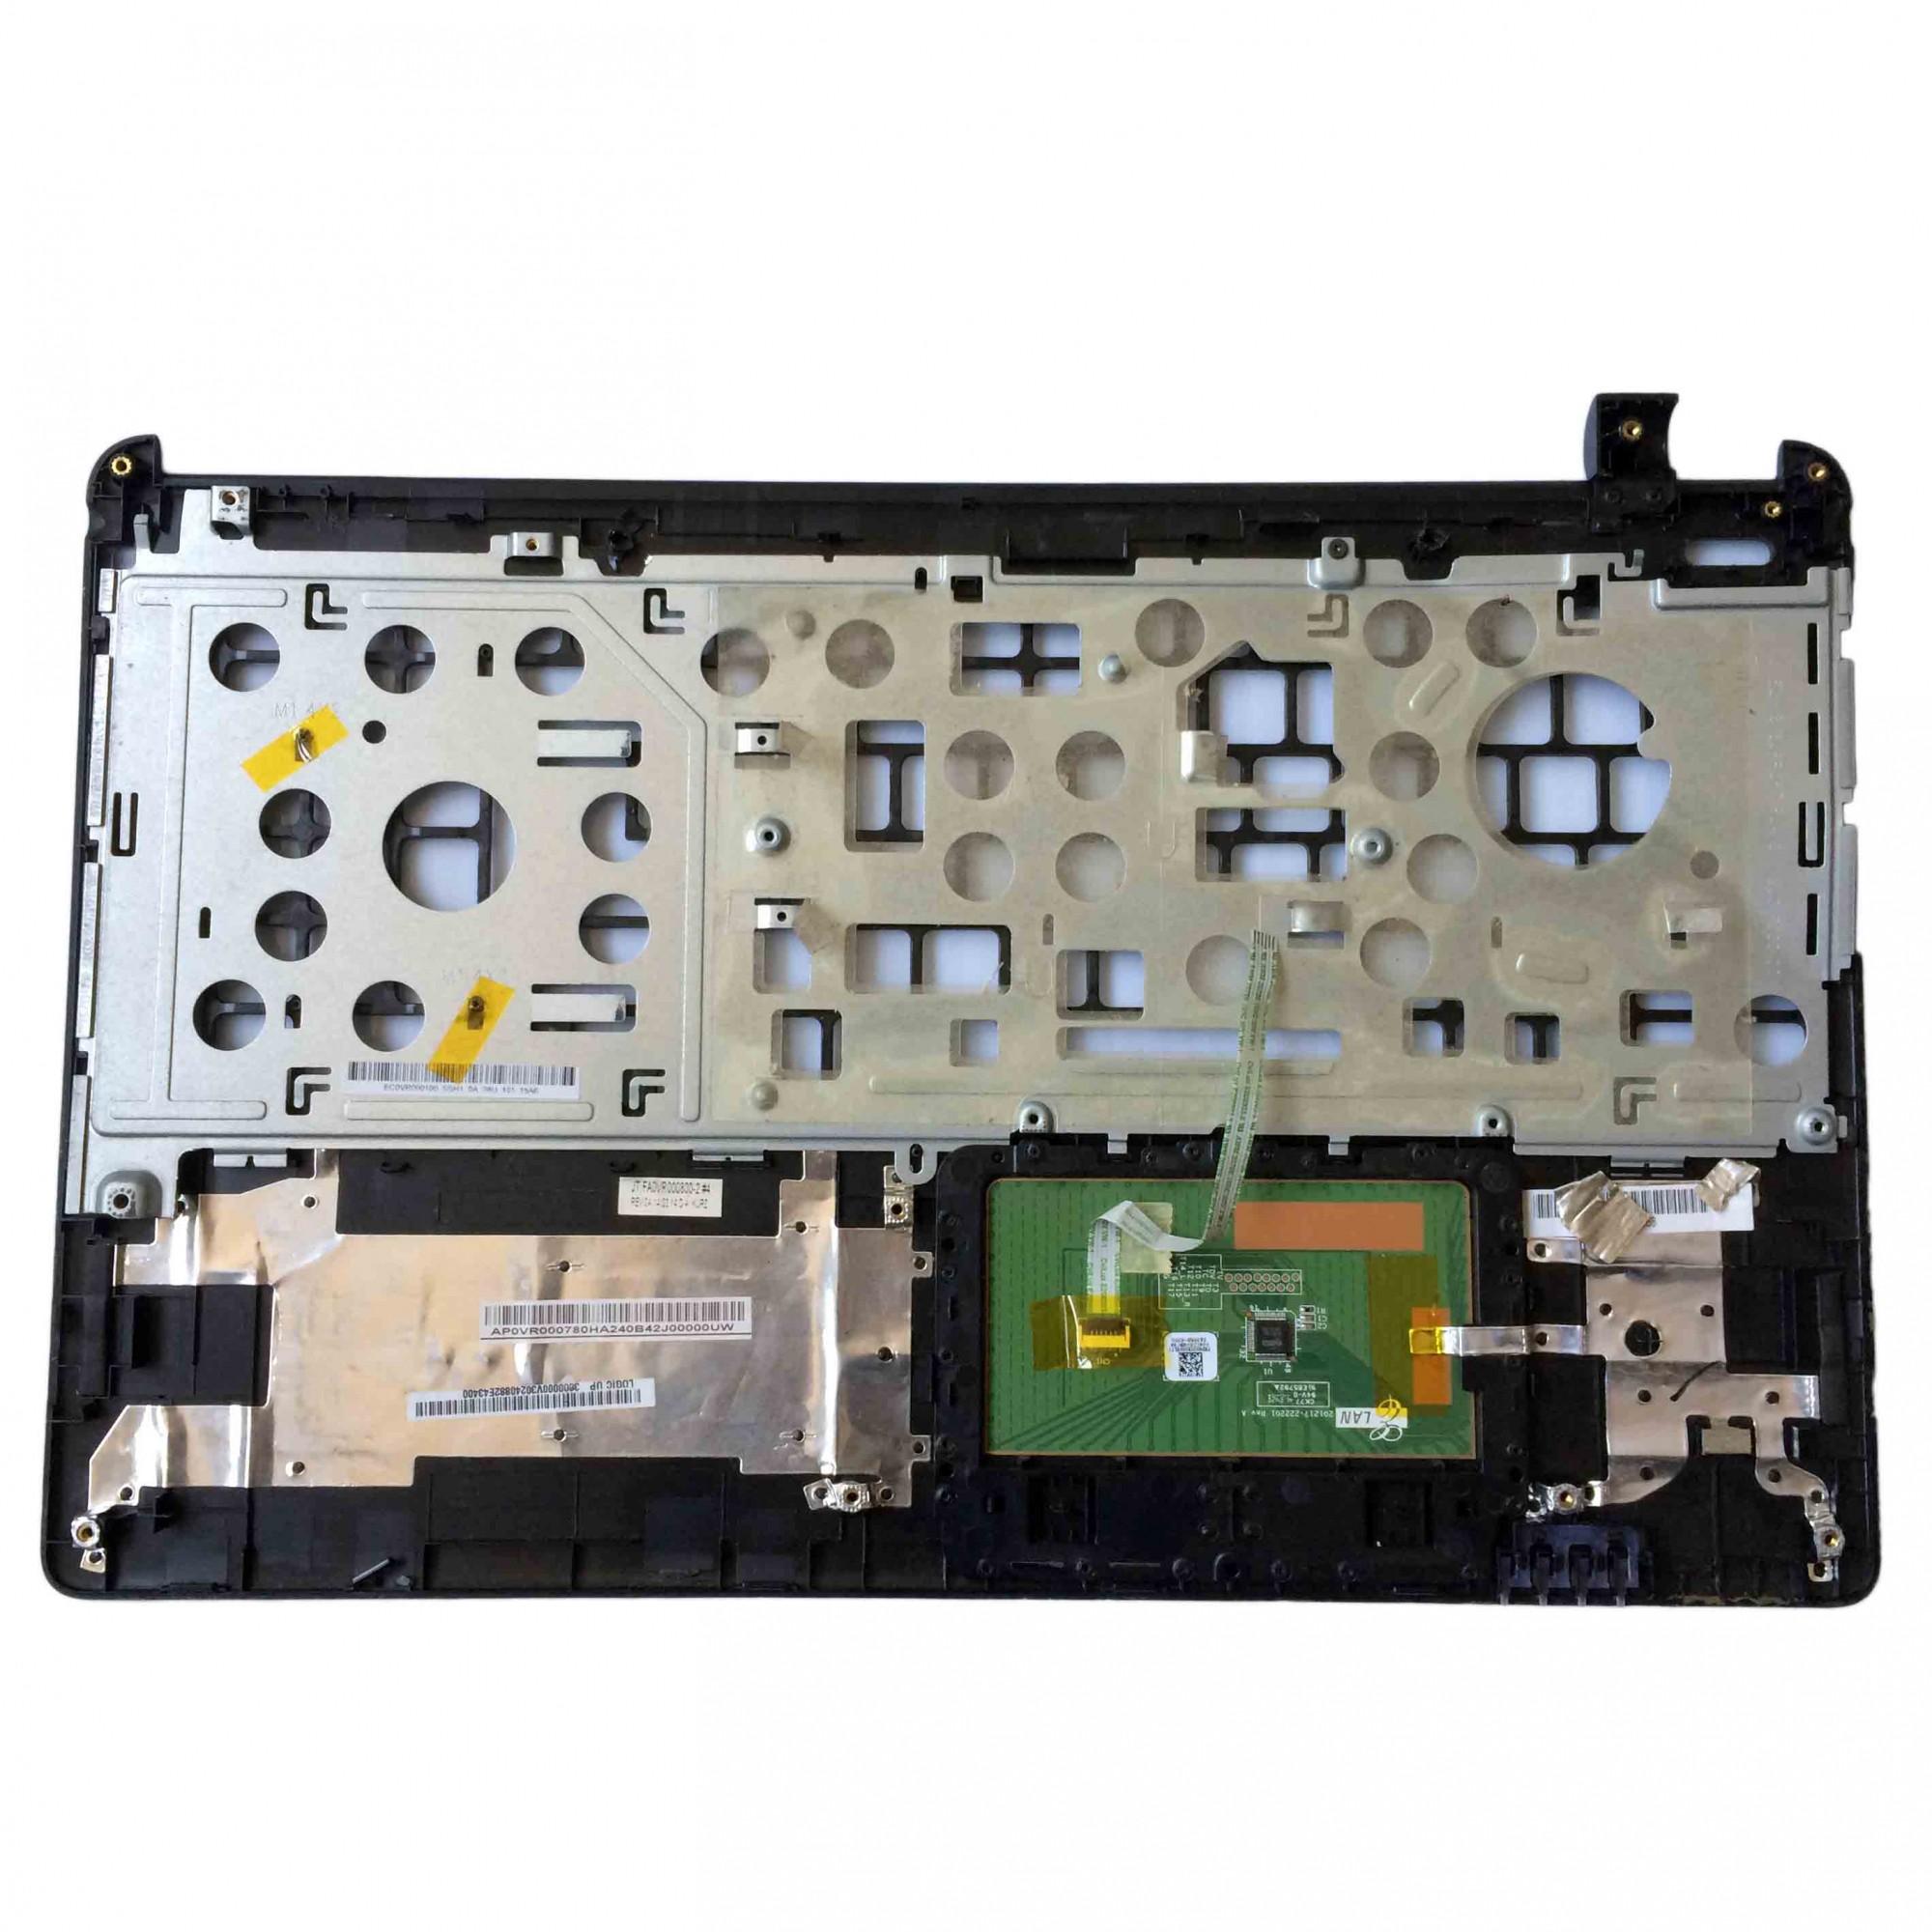 Carcaça Base Superior + TouchPad + Flat Notebook Acer Aspire E1 572 E1 510 PN:Ap0vr0007 - Retirado